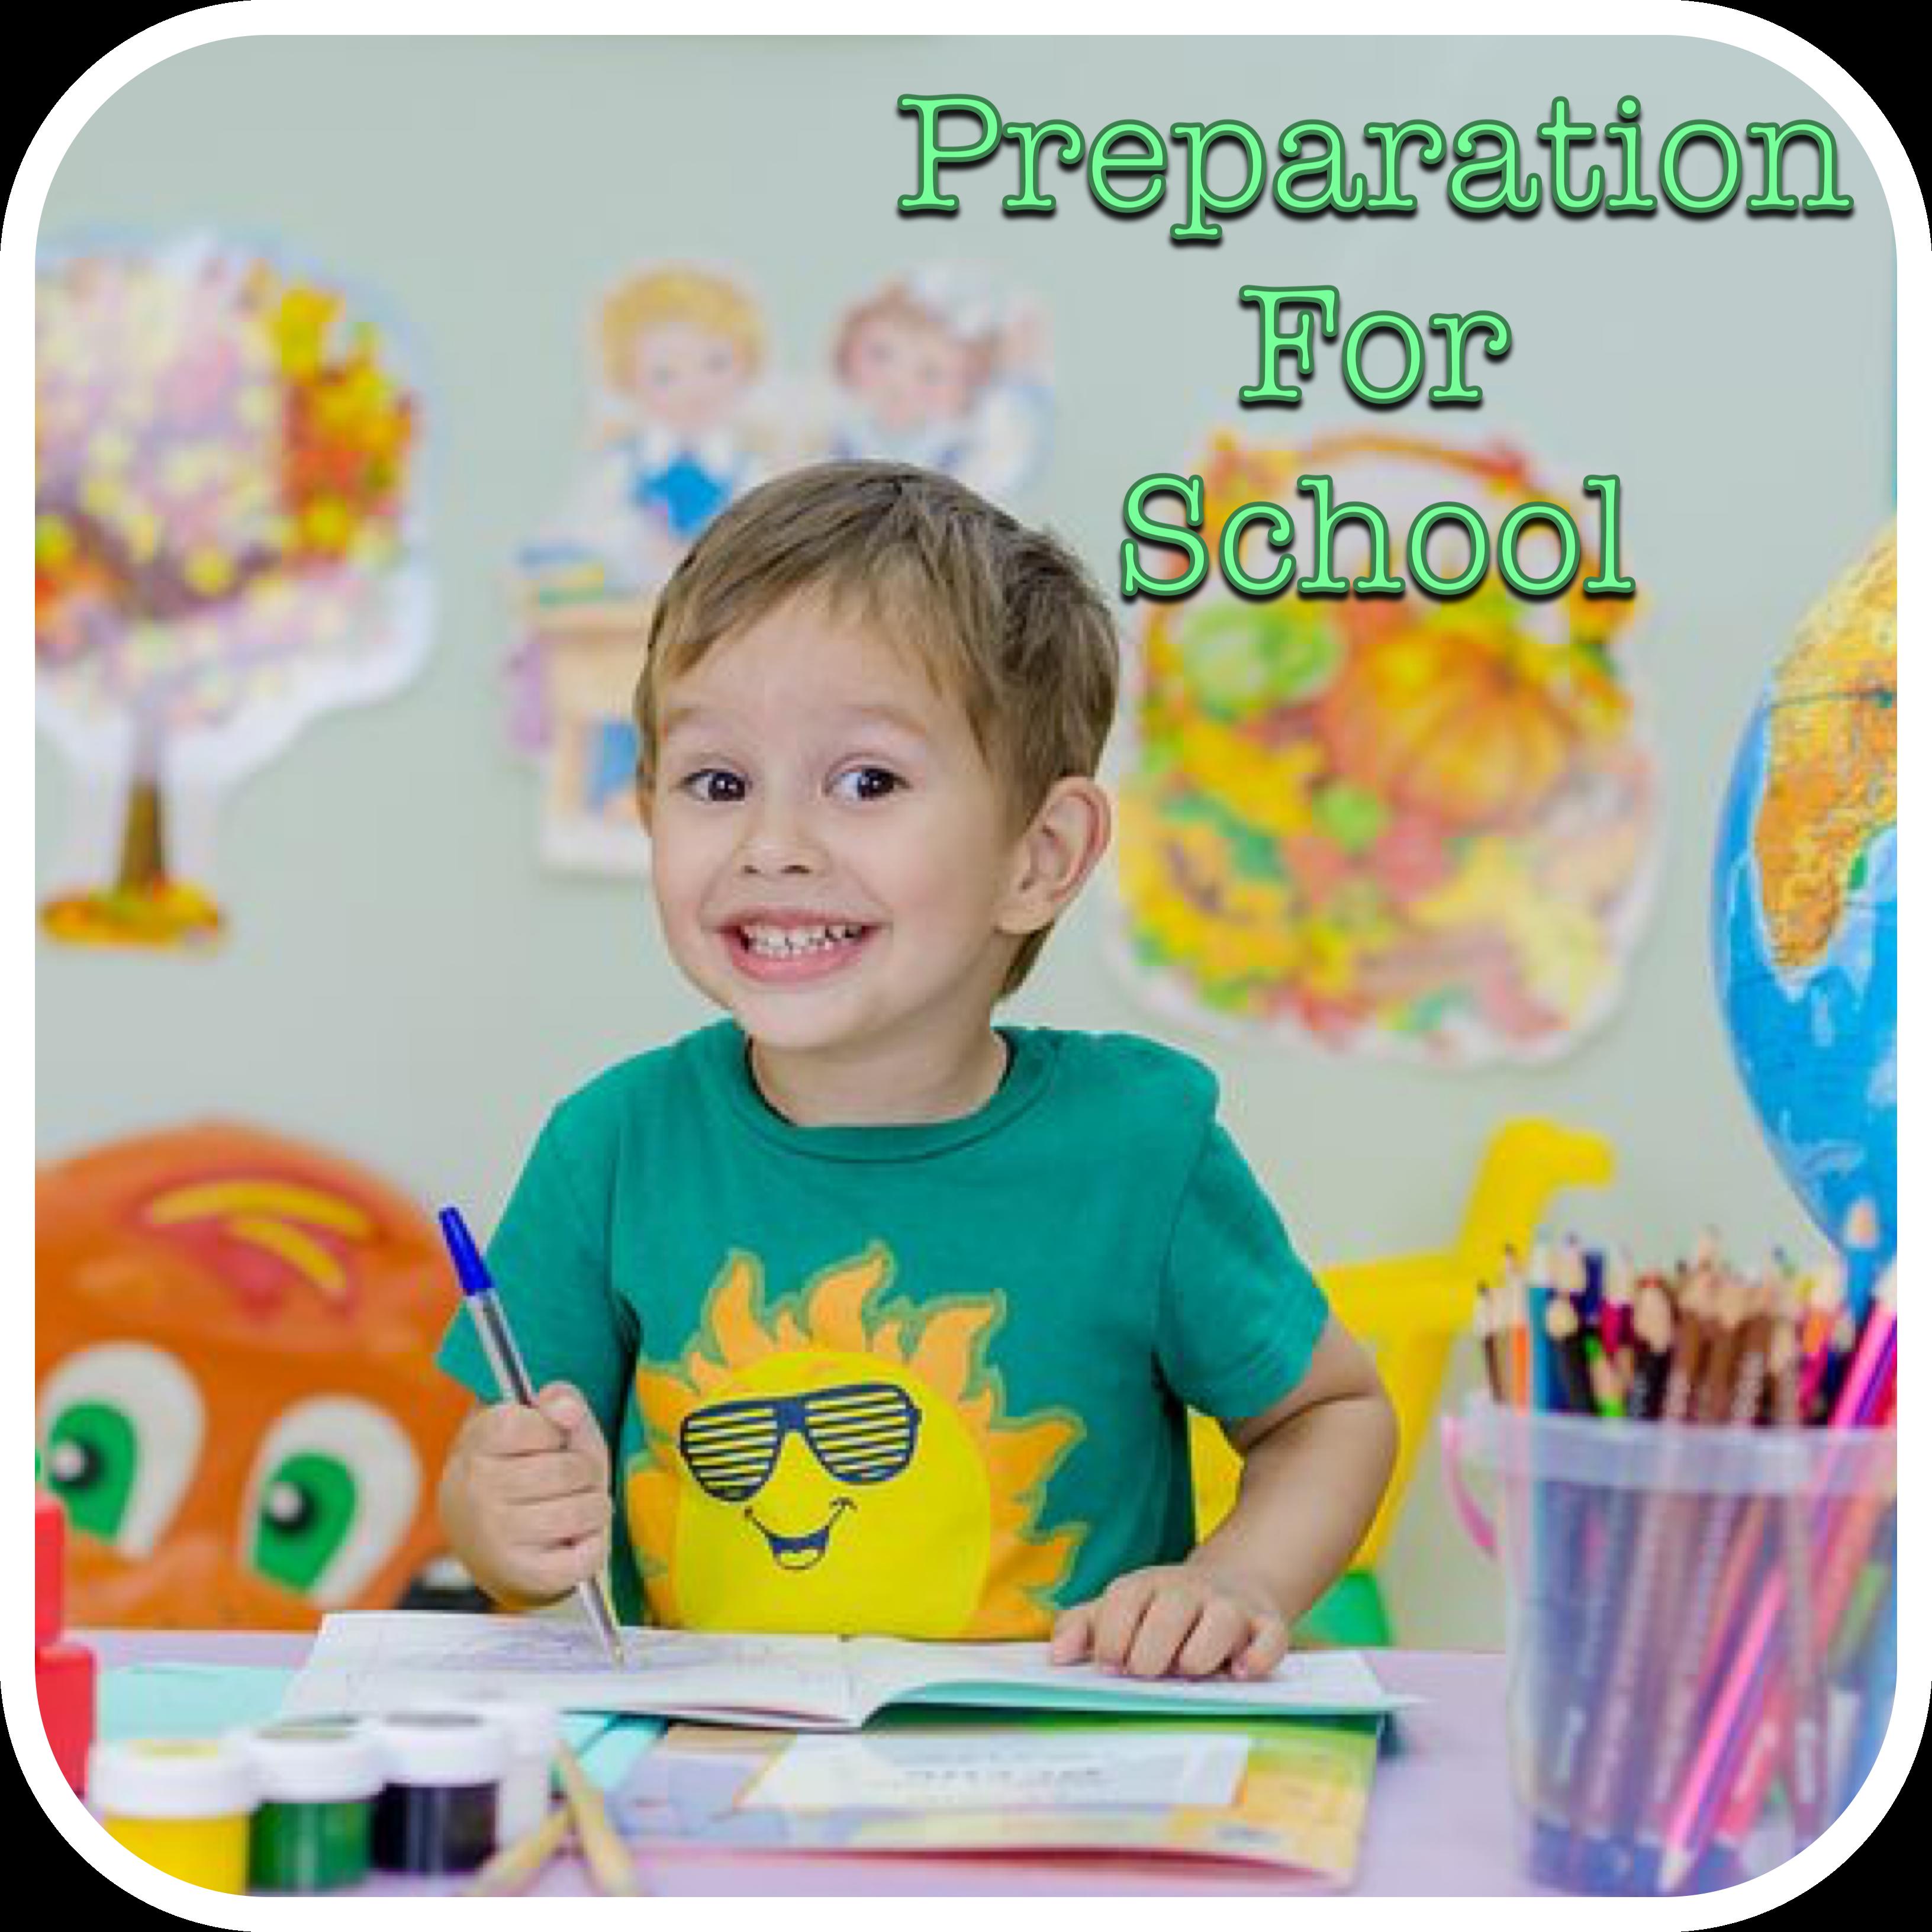 Preparation for School Logo (Young Boy Drawing)